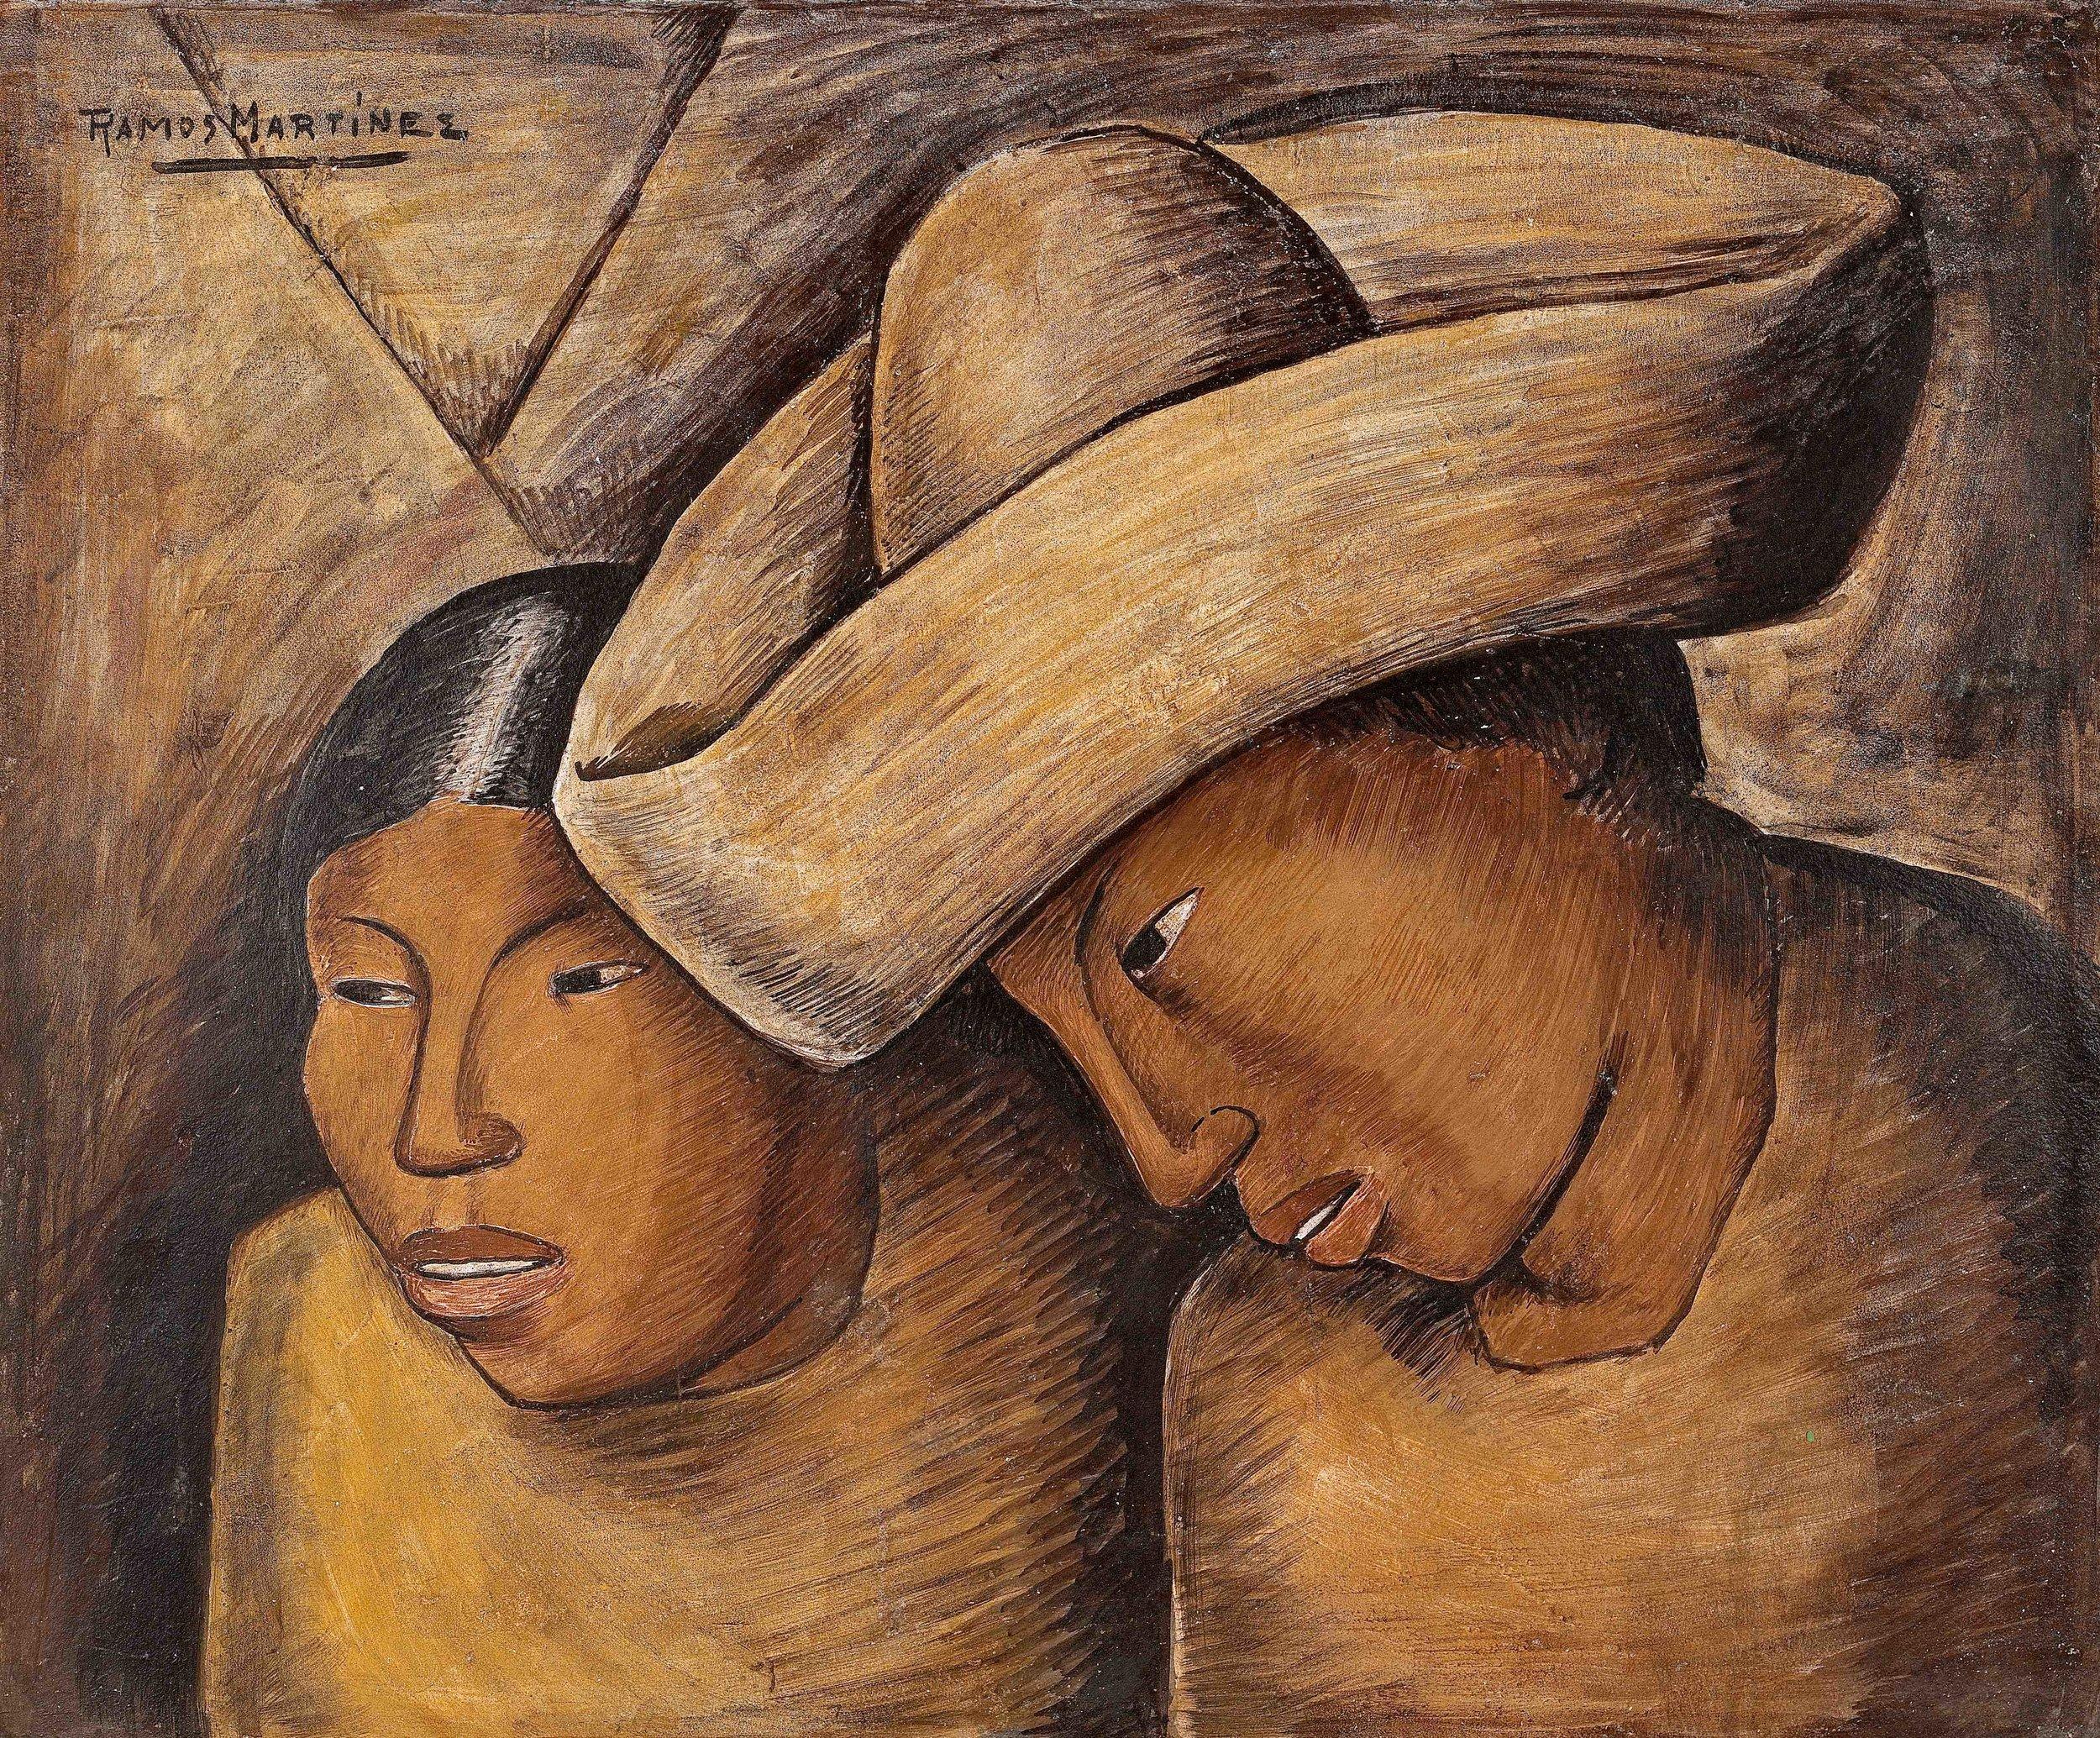 Juan y Lupe / Juan and Lupe  1940 fresco on fiber board / fresco sobre tabla de fibra vulcanizada 18.5 x 22.5 inches; 47 x 57.2 centímetros Private collection